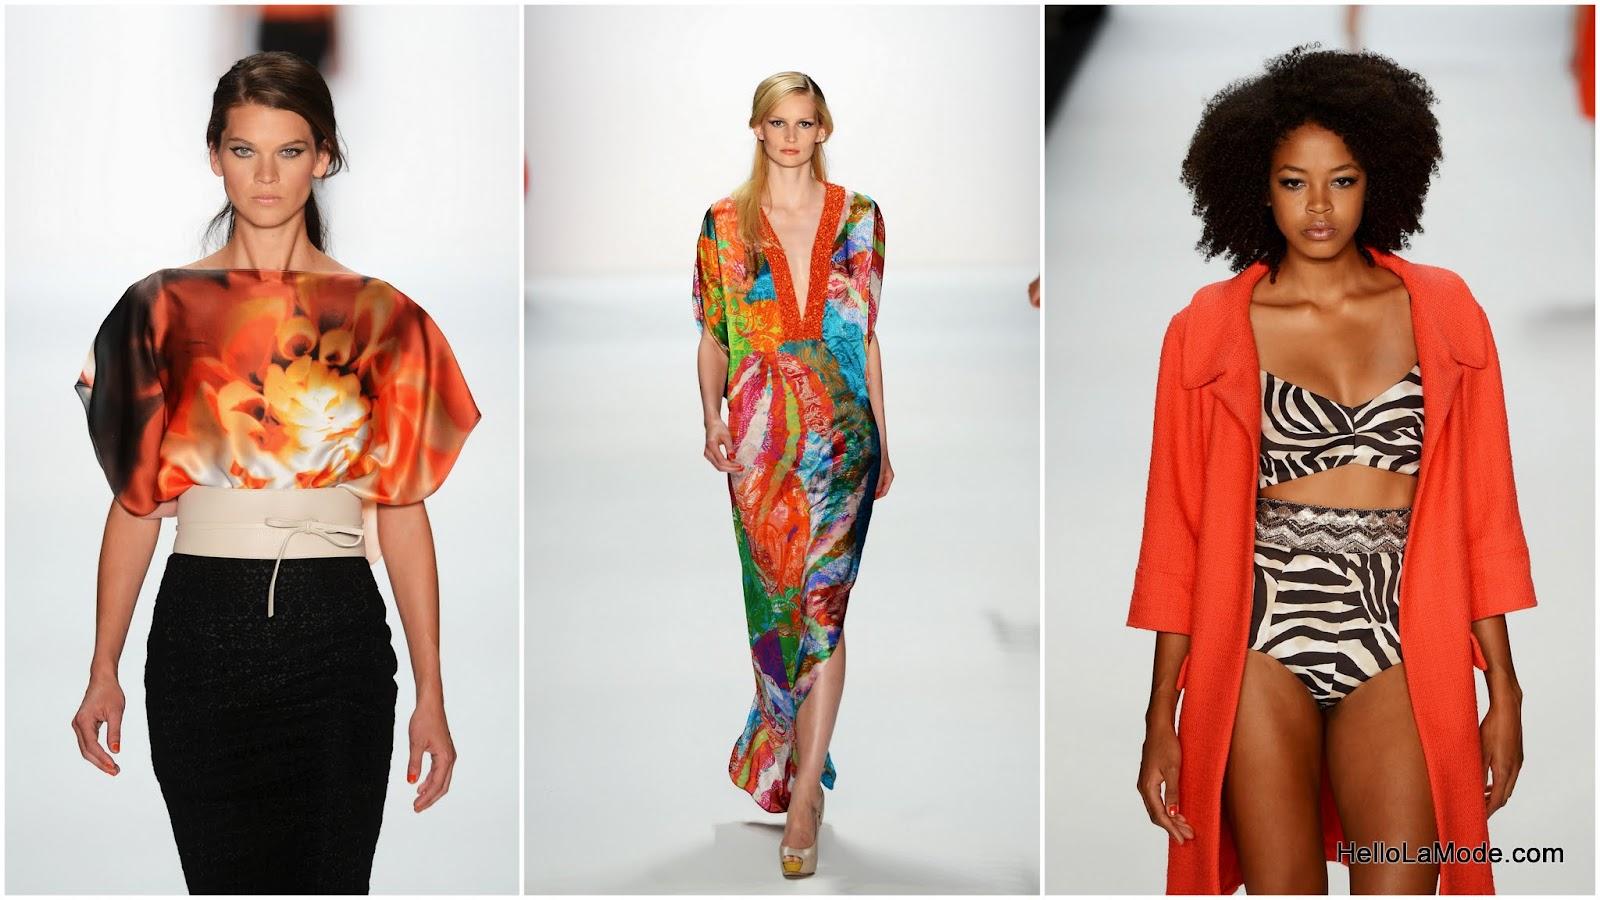 MS. FABULOUS: Berlin Fashion Week: Laurel Spring 2013